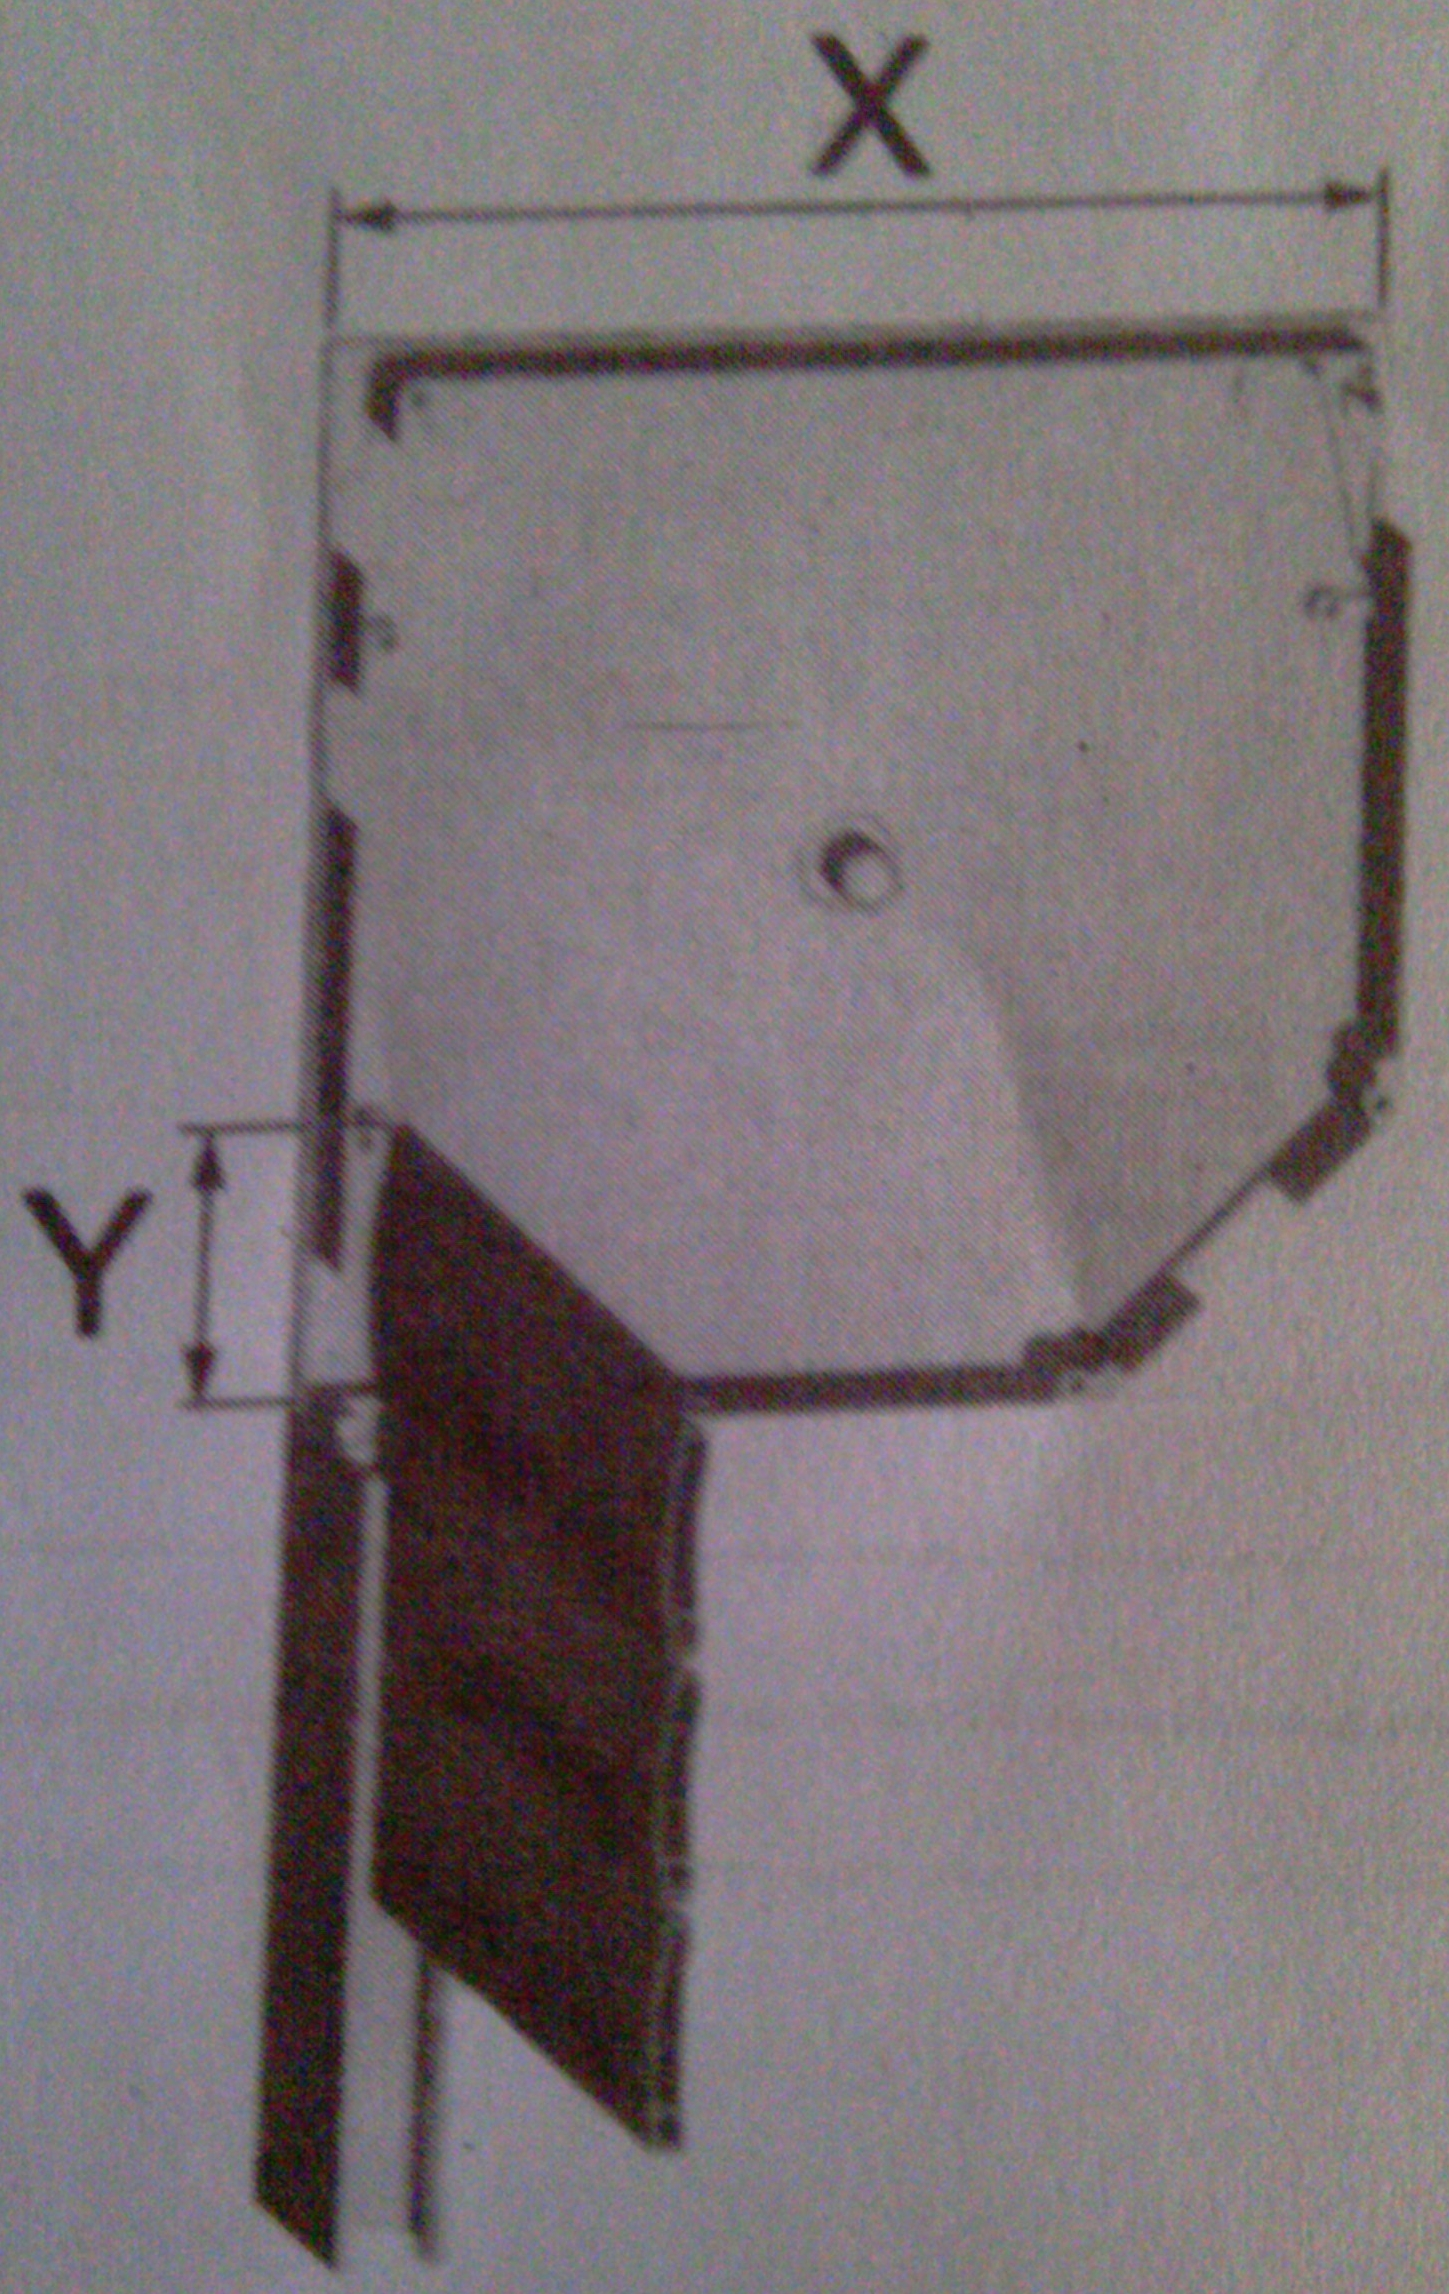 Volet roulant electrique somfy reglage fin de course Volet roulant electrique